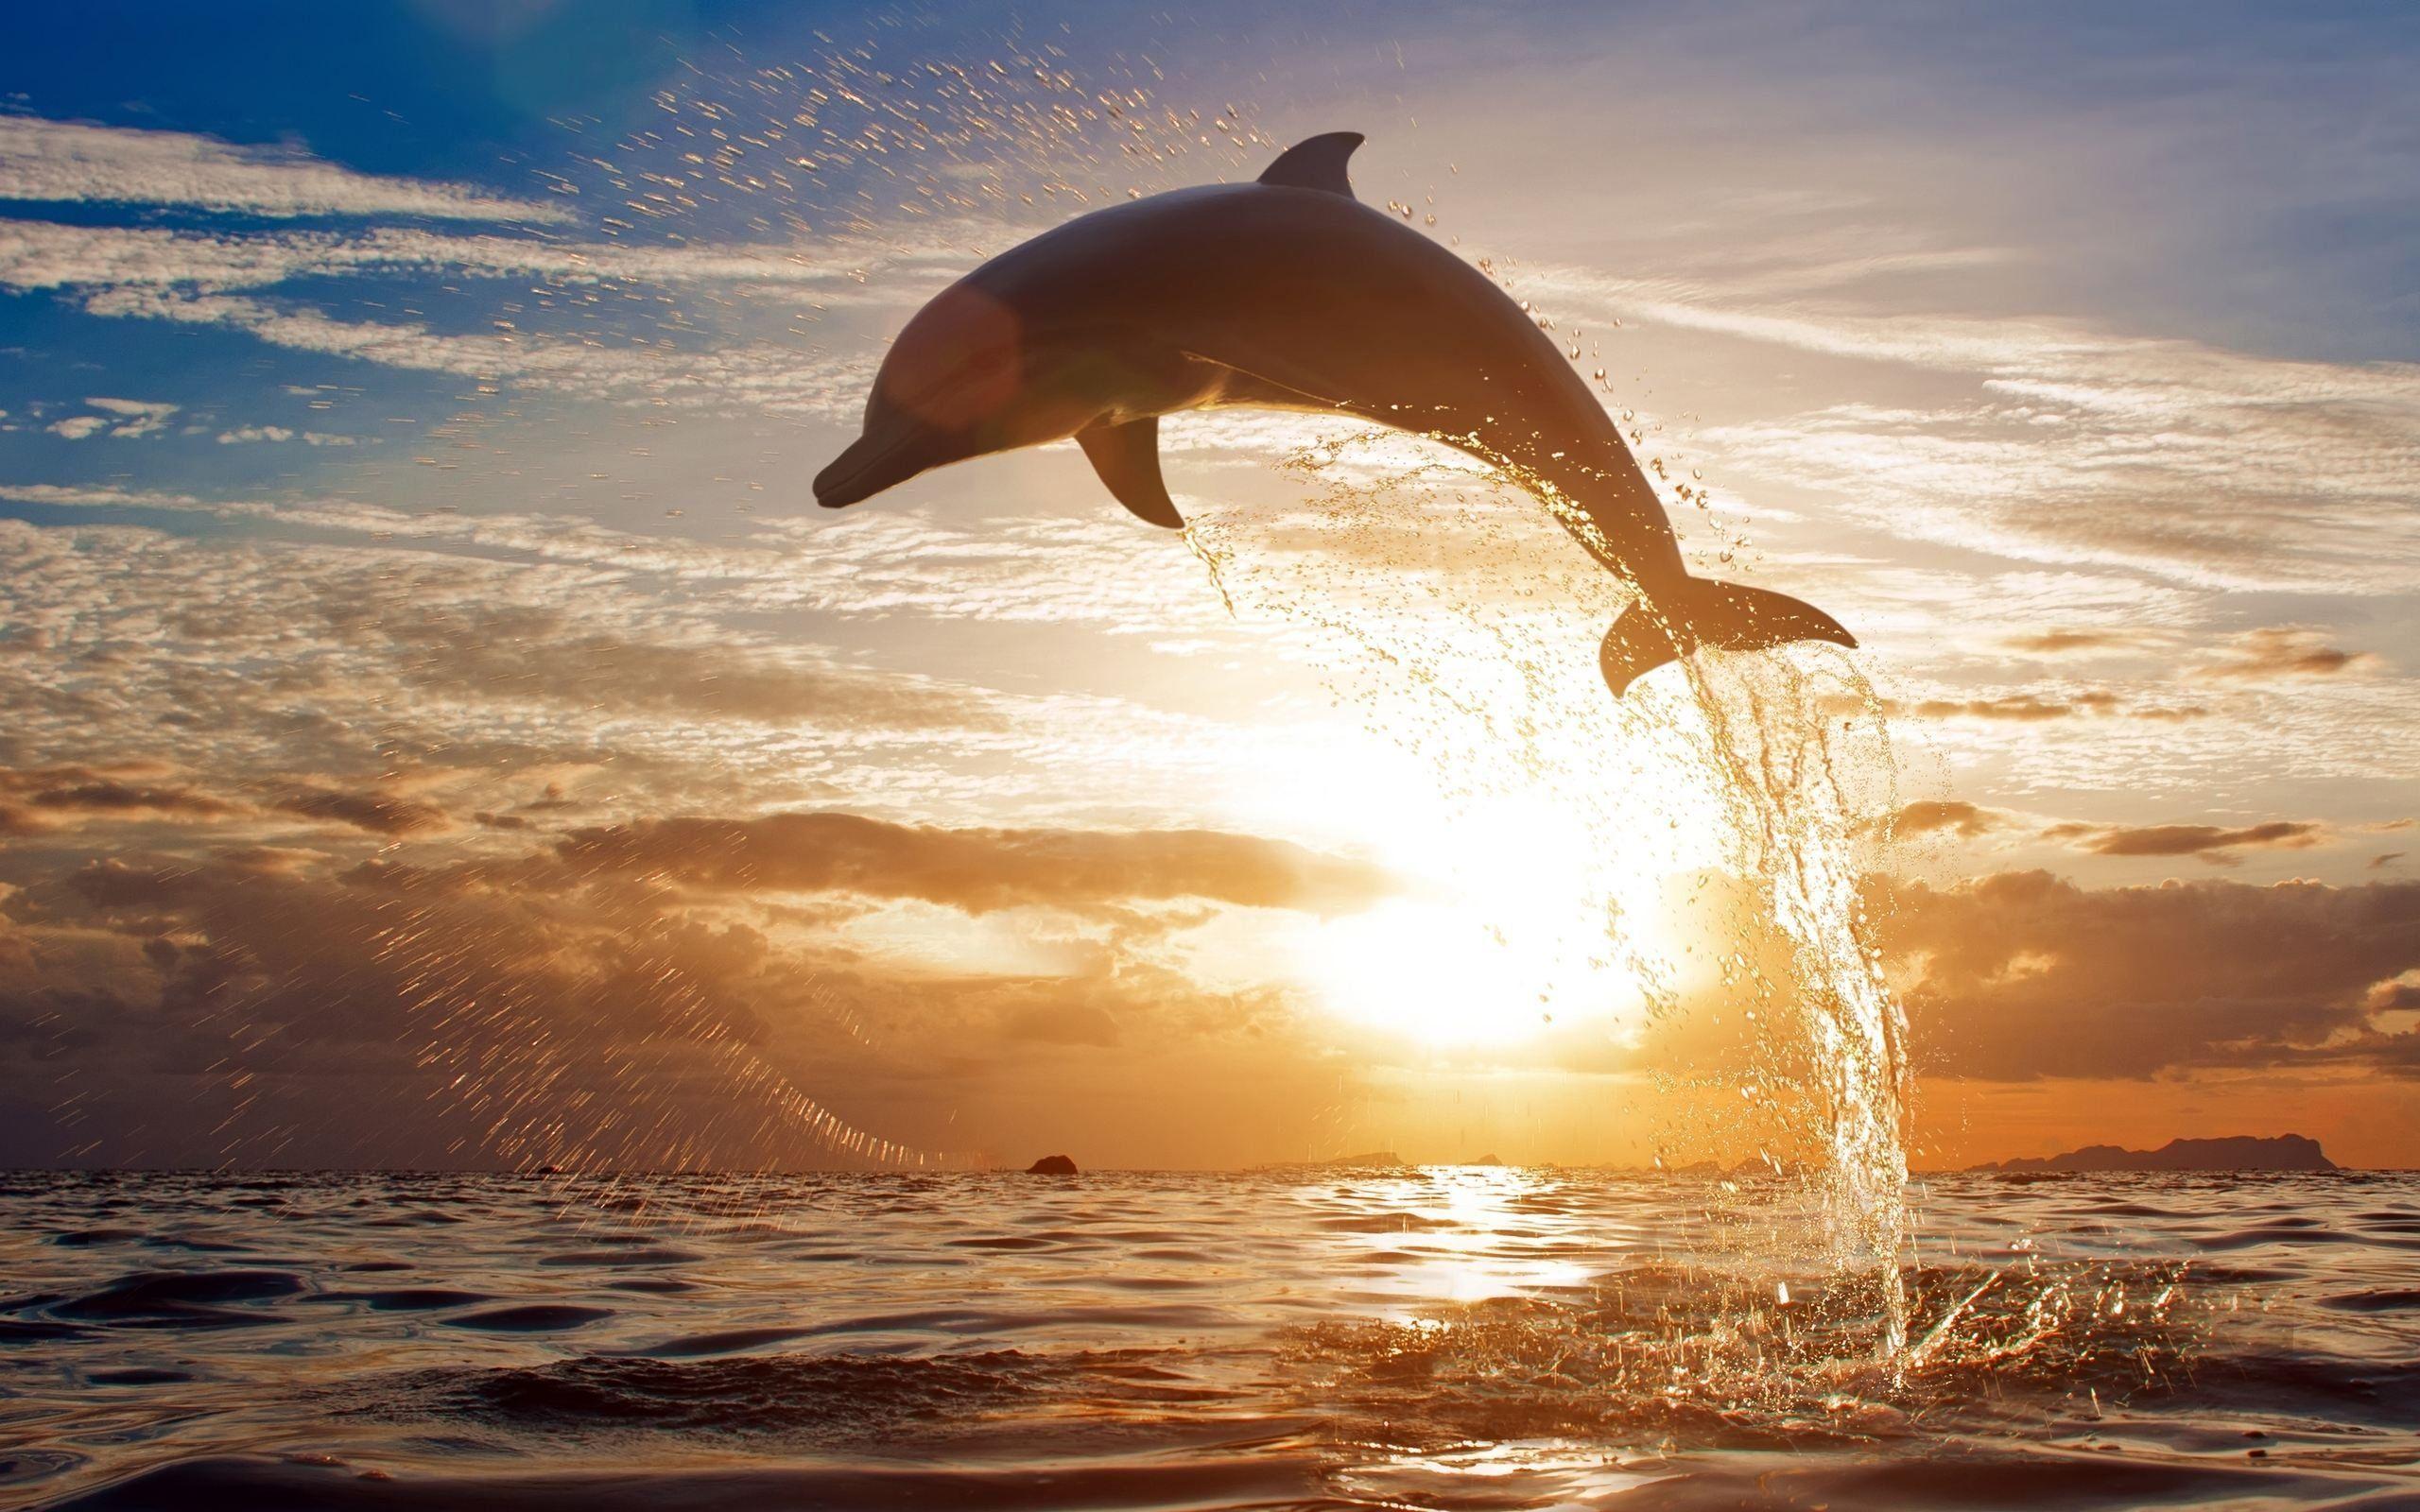 Dolphin Jumping Wallpaper Hd Widescreen Hd Wallpapers Source Ocean Life Ocean Animals Dolphins